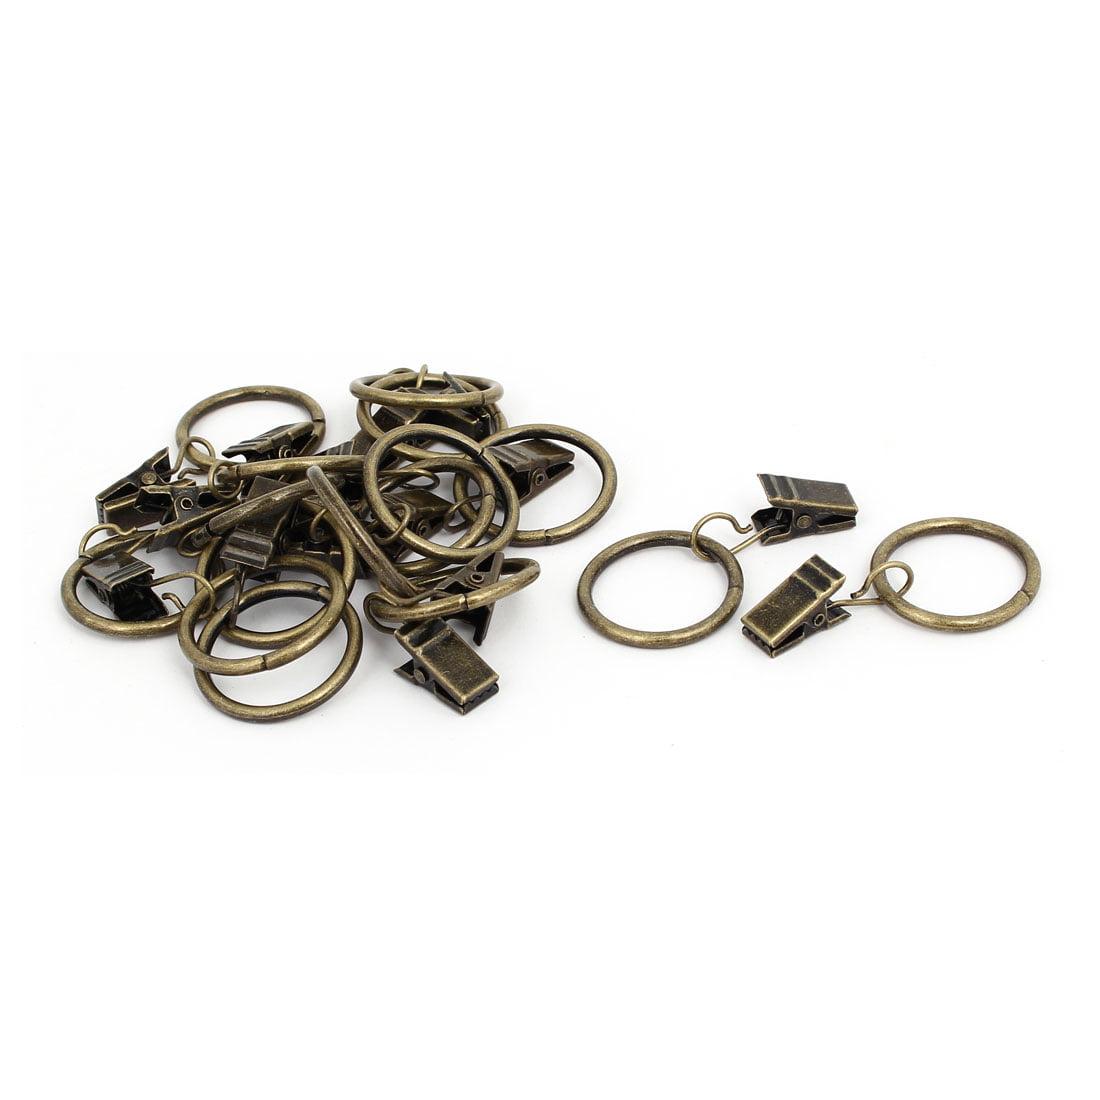 25mm Inner Dia Curtain Drapery Hanging Rings Clips Bronze